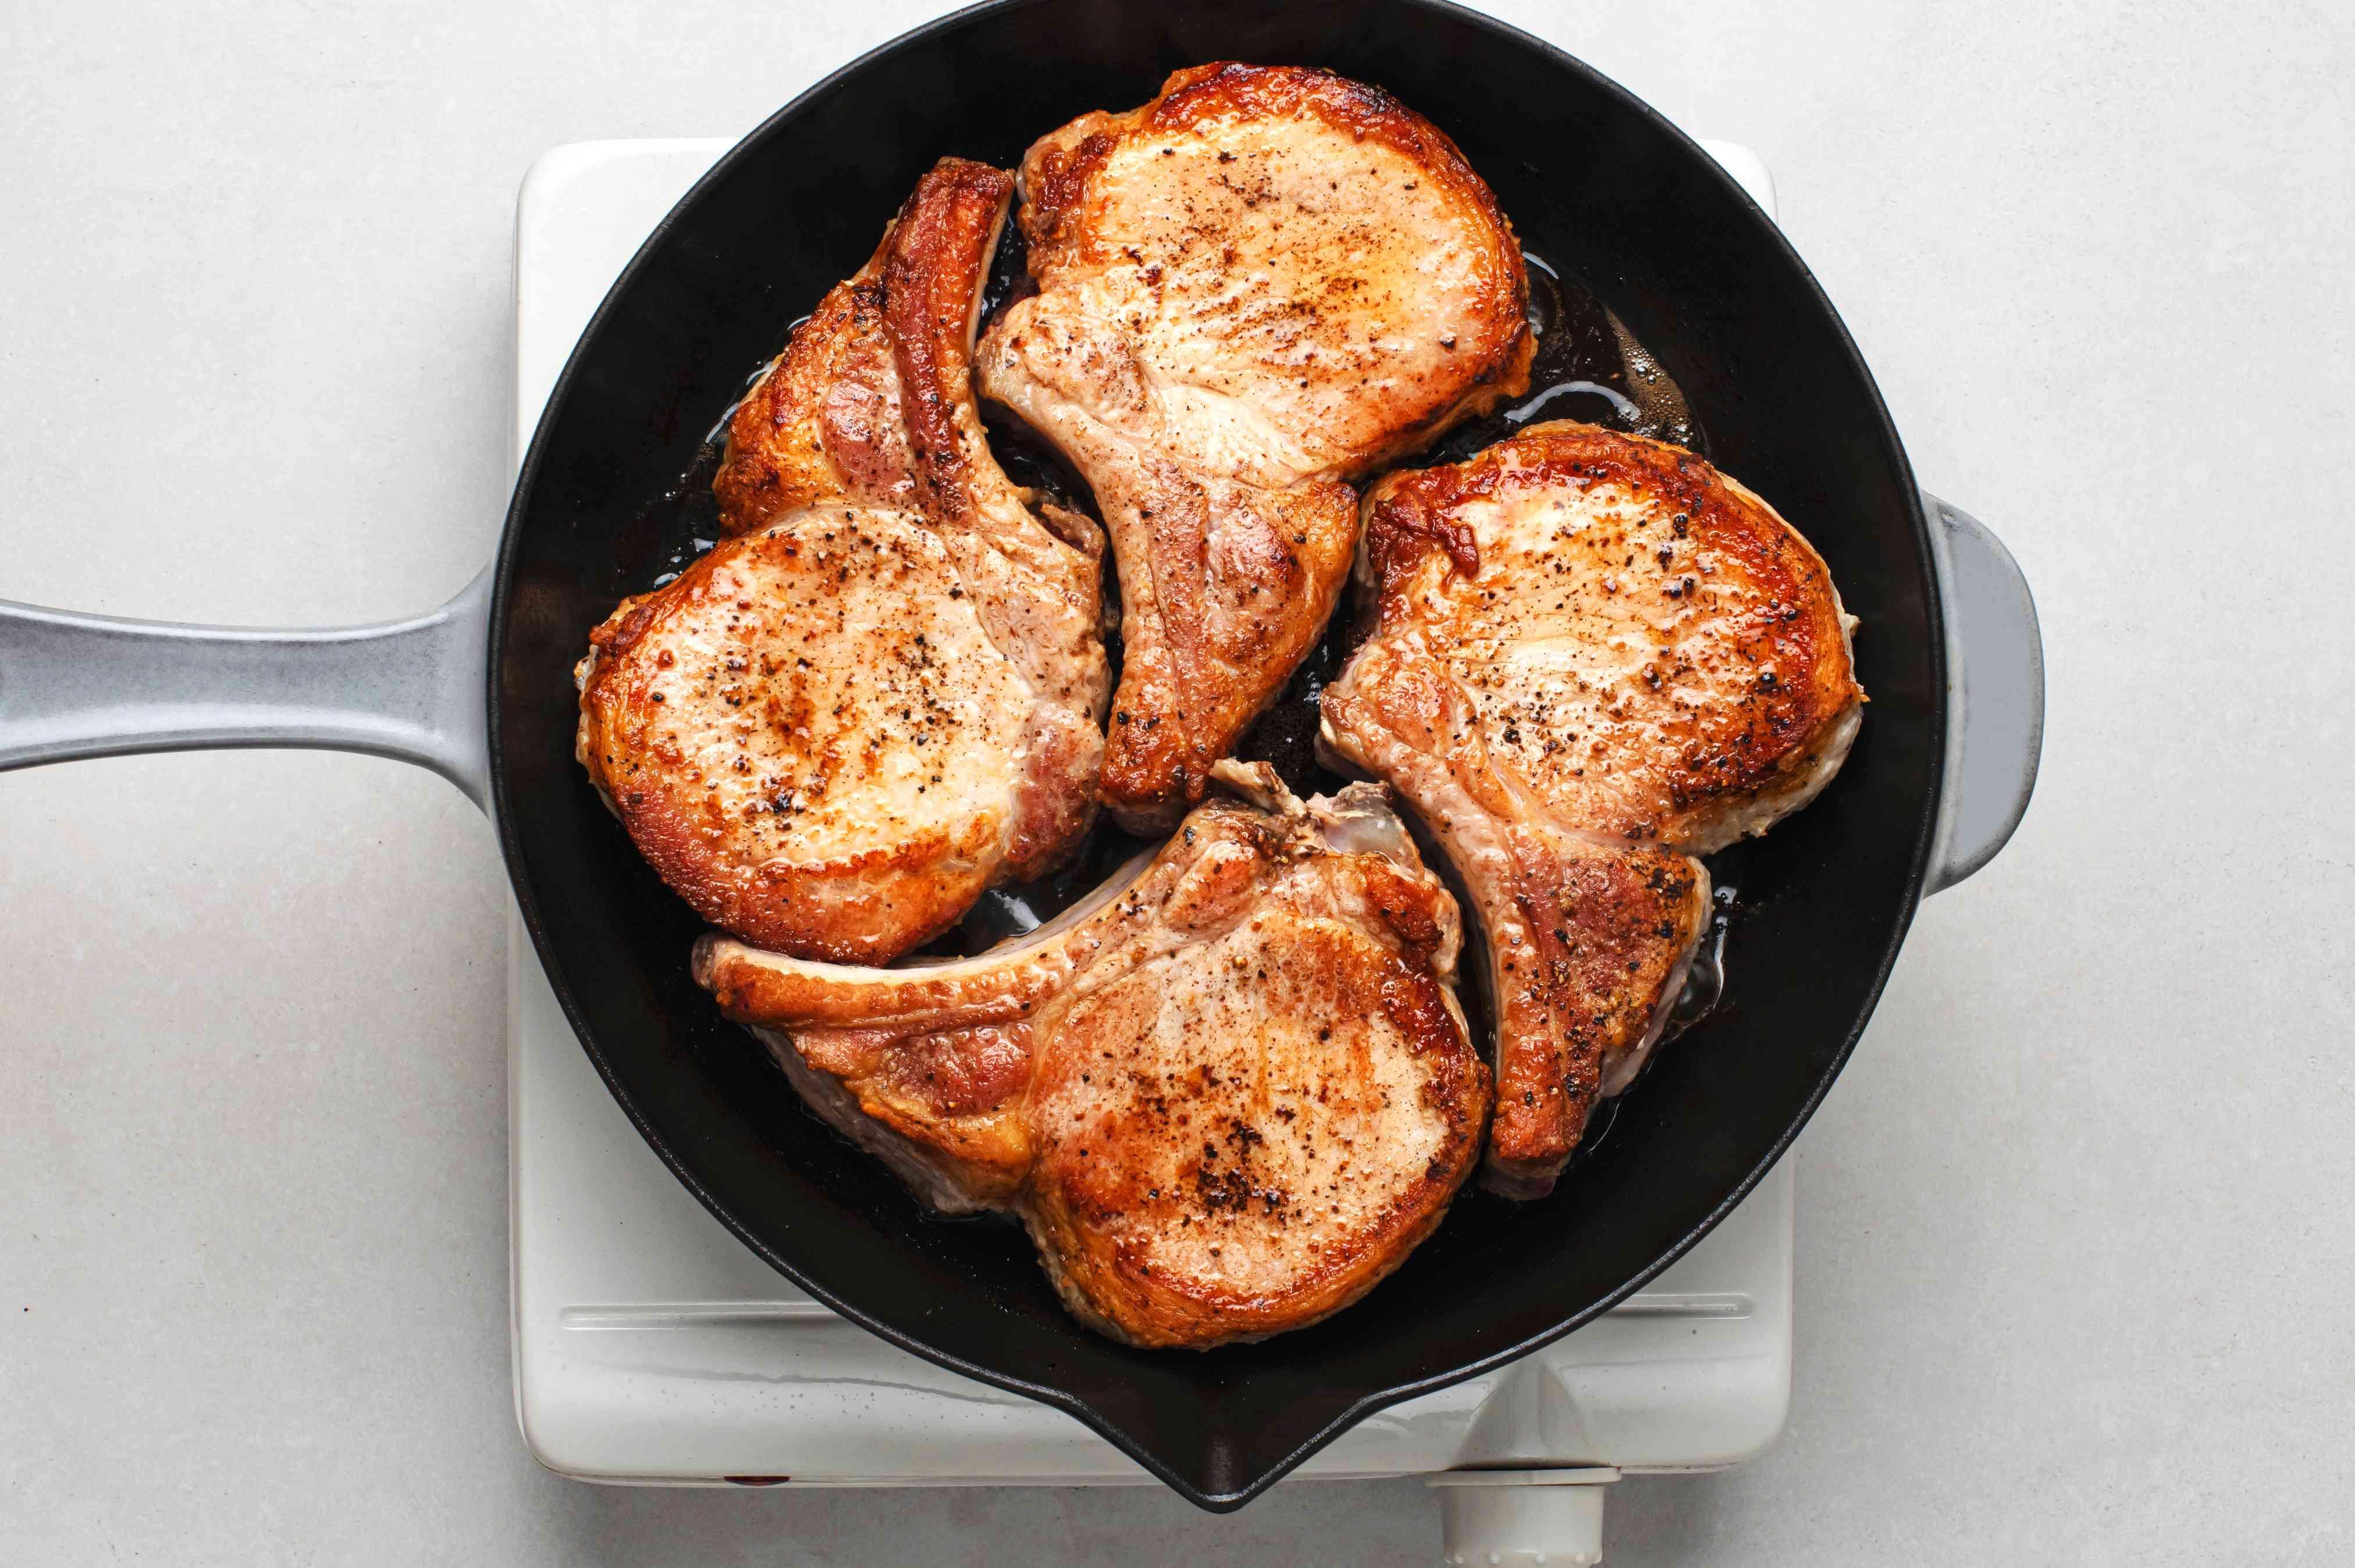 pork chops cooking in a skillet